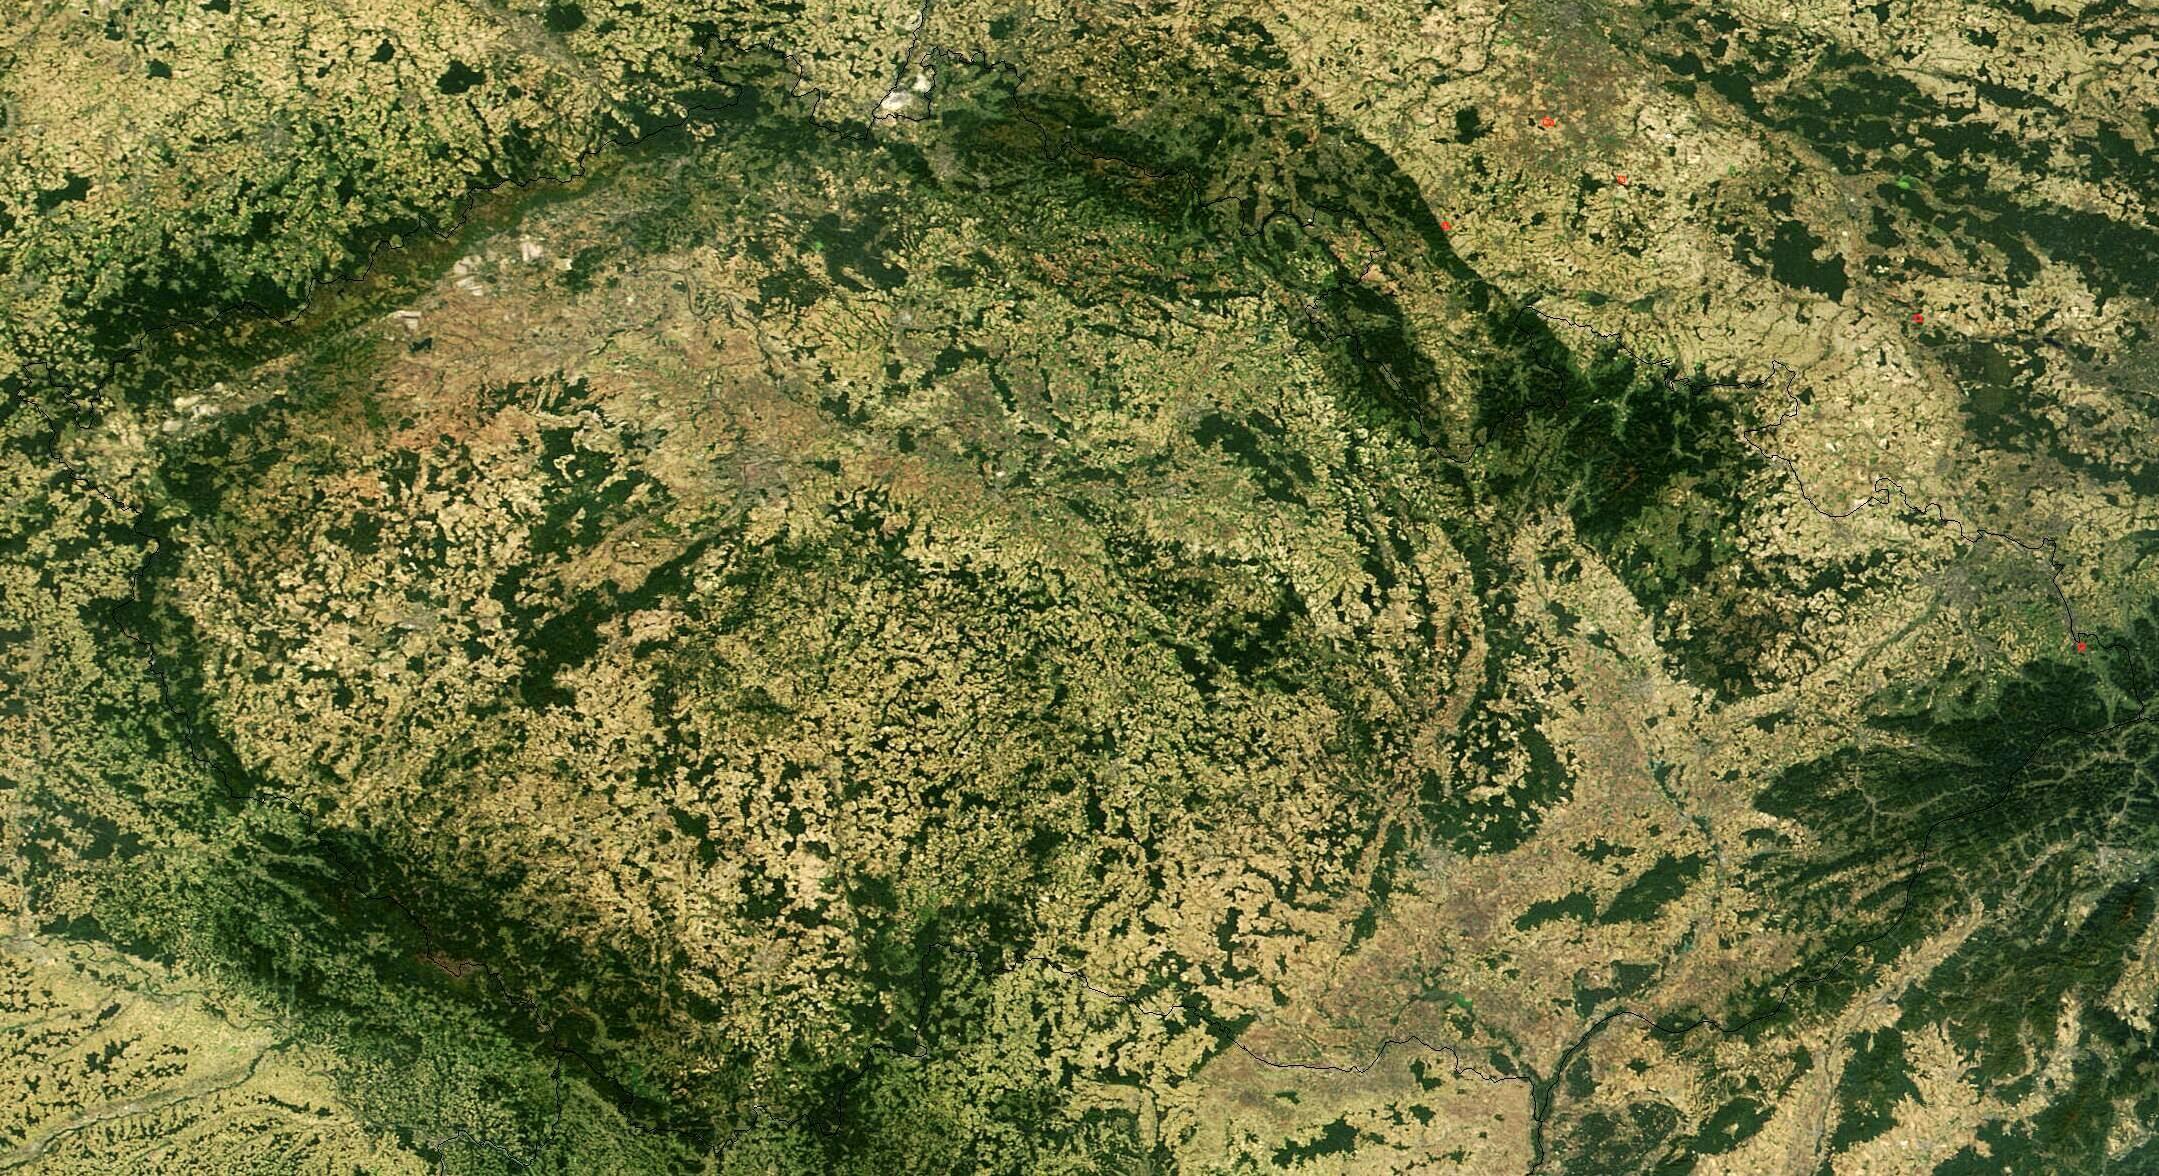 Czech Republic | CZECH REPUBLIC | Czech republic, Satellite ... on satellite map of saipan, satellite map of mali, satellite map of vatican city, satellite map of brunei darussalam, satellite map of prague, satellite map of abu dhabi, satellite map of the gambia, satellite map of montserrat, satellite map of caribbean islands, satellite map of the vatican, satellite map of mauritania, satellite map of iraq, satellite map of united states of america, satellite map of tunisia, satellite map of kosovo, satellite map of western europe, satellite map of qatar, satellite map of uzbekistan, satellite map of trinidad and tobago, satellite map of somalia,